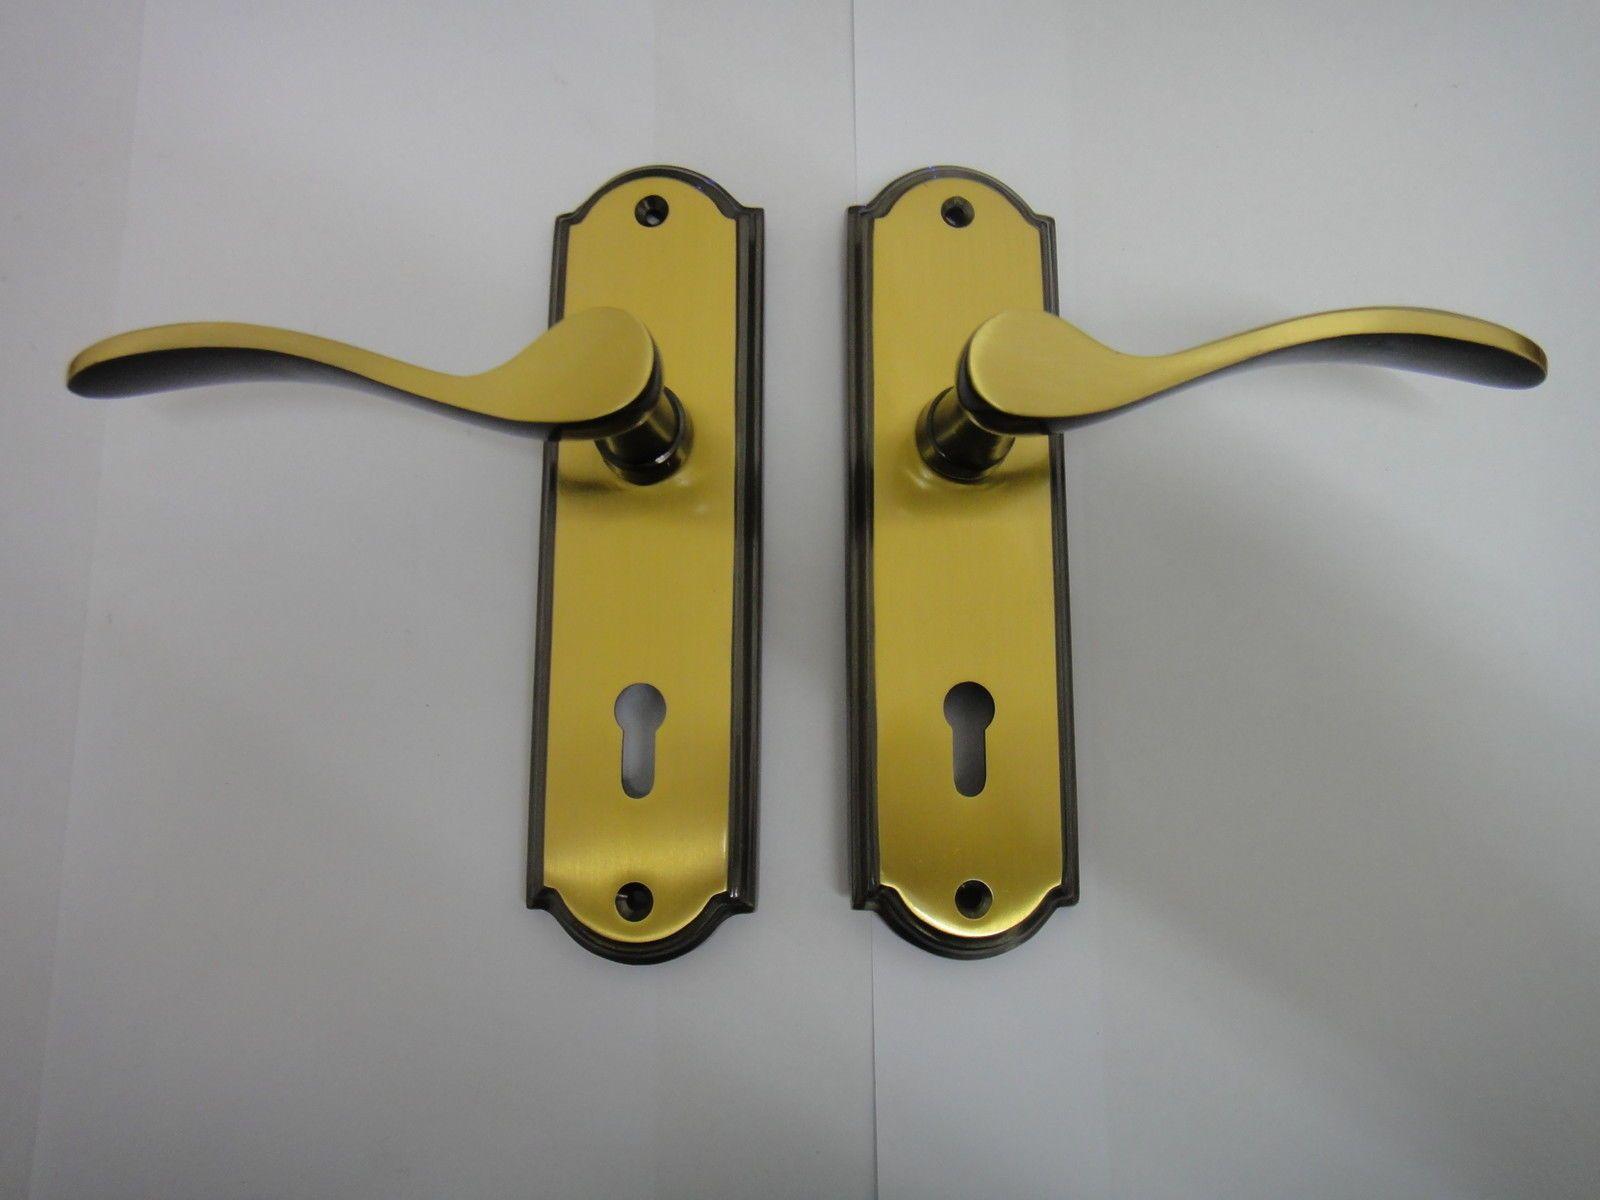 Homebase howard lever lock handle in antique brass finish - new & Homebase howard lever lock handle in antique brass finish - new ... pezcame.com